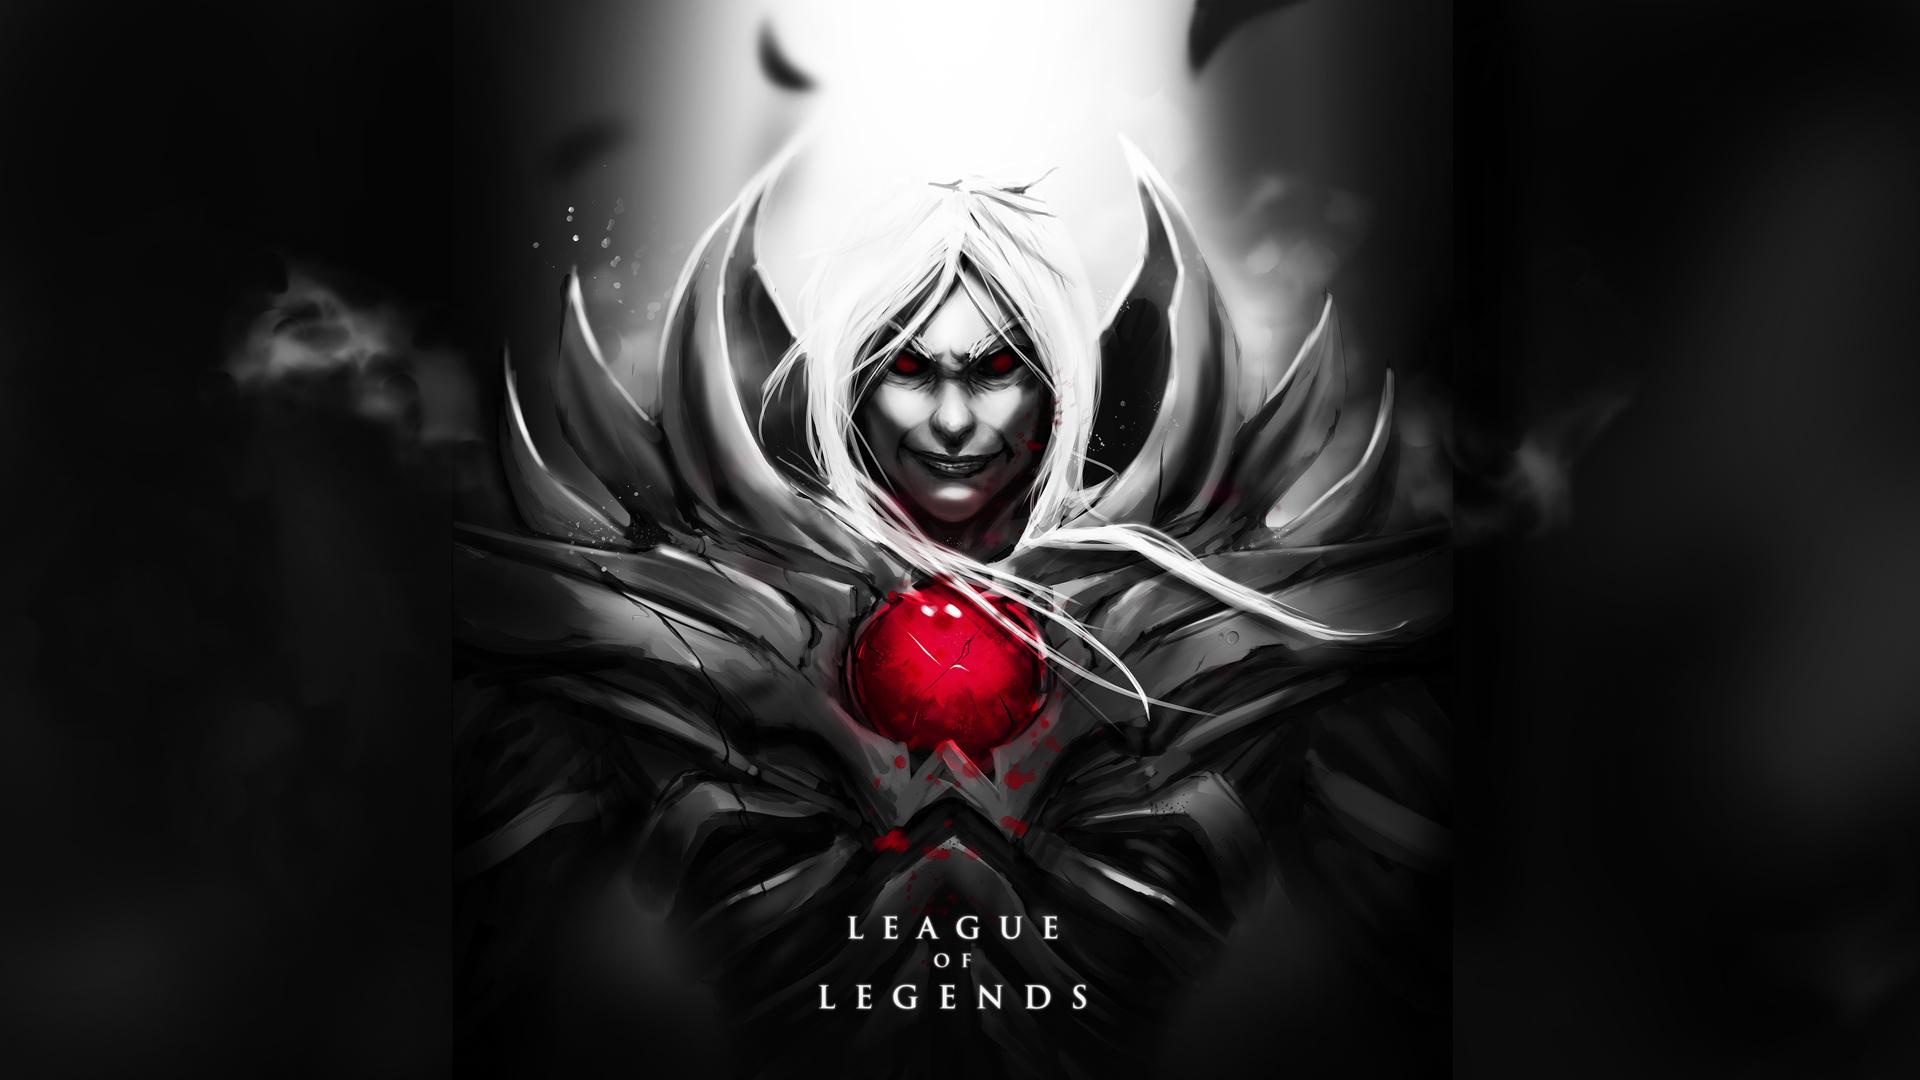 League of Legends wallpaper 94